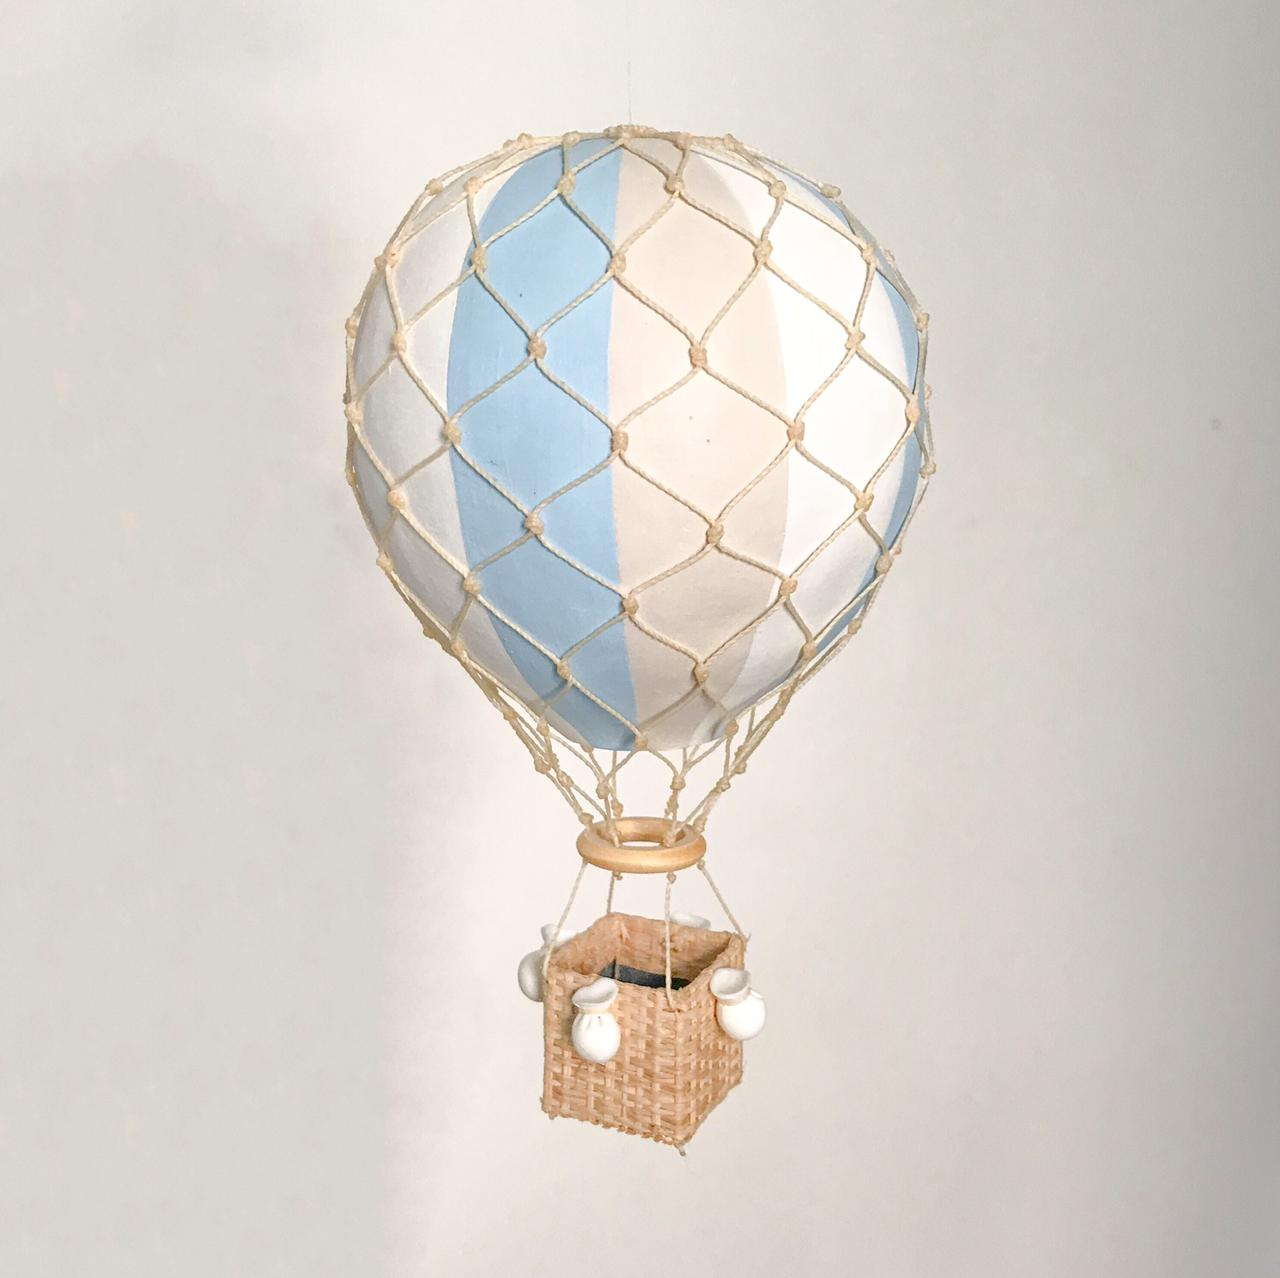 Balão Kiko/Kikinho Azul Pastel